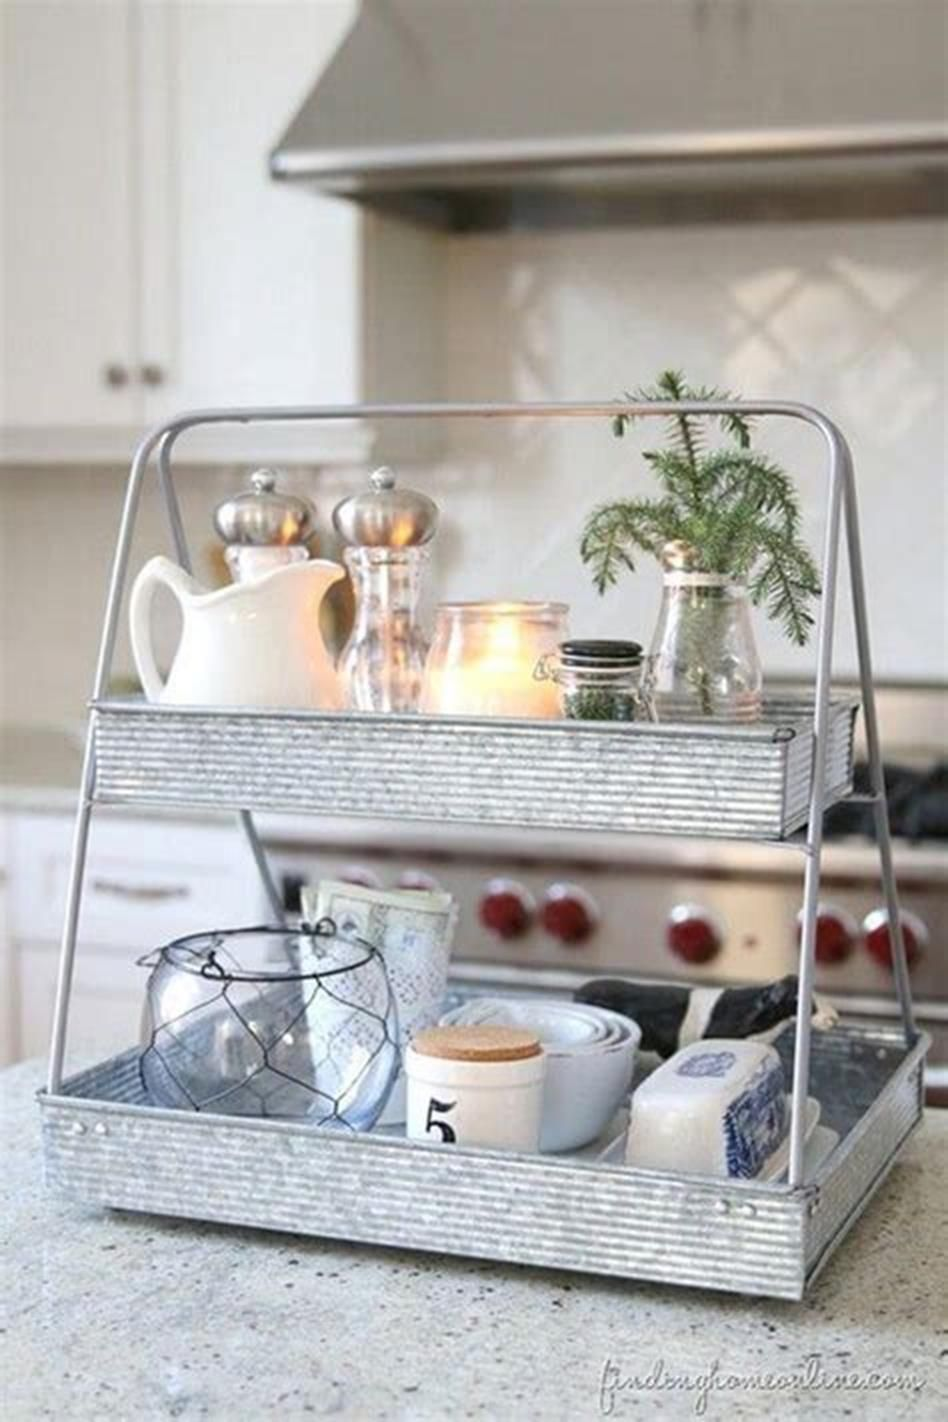 Top 29 Diy Ideas Adding Rustic Farmhouse Feels To Kitchen: 40+ Beautiful Farmhouse Style Tray Decor Ideas